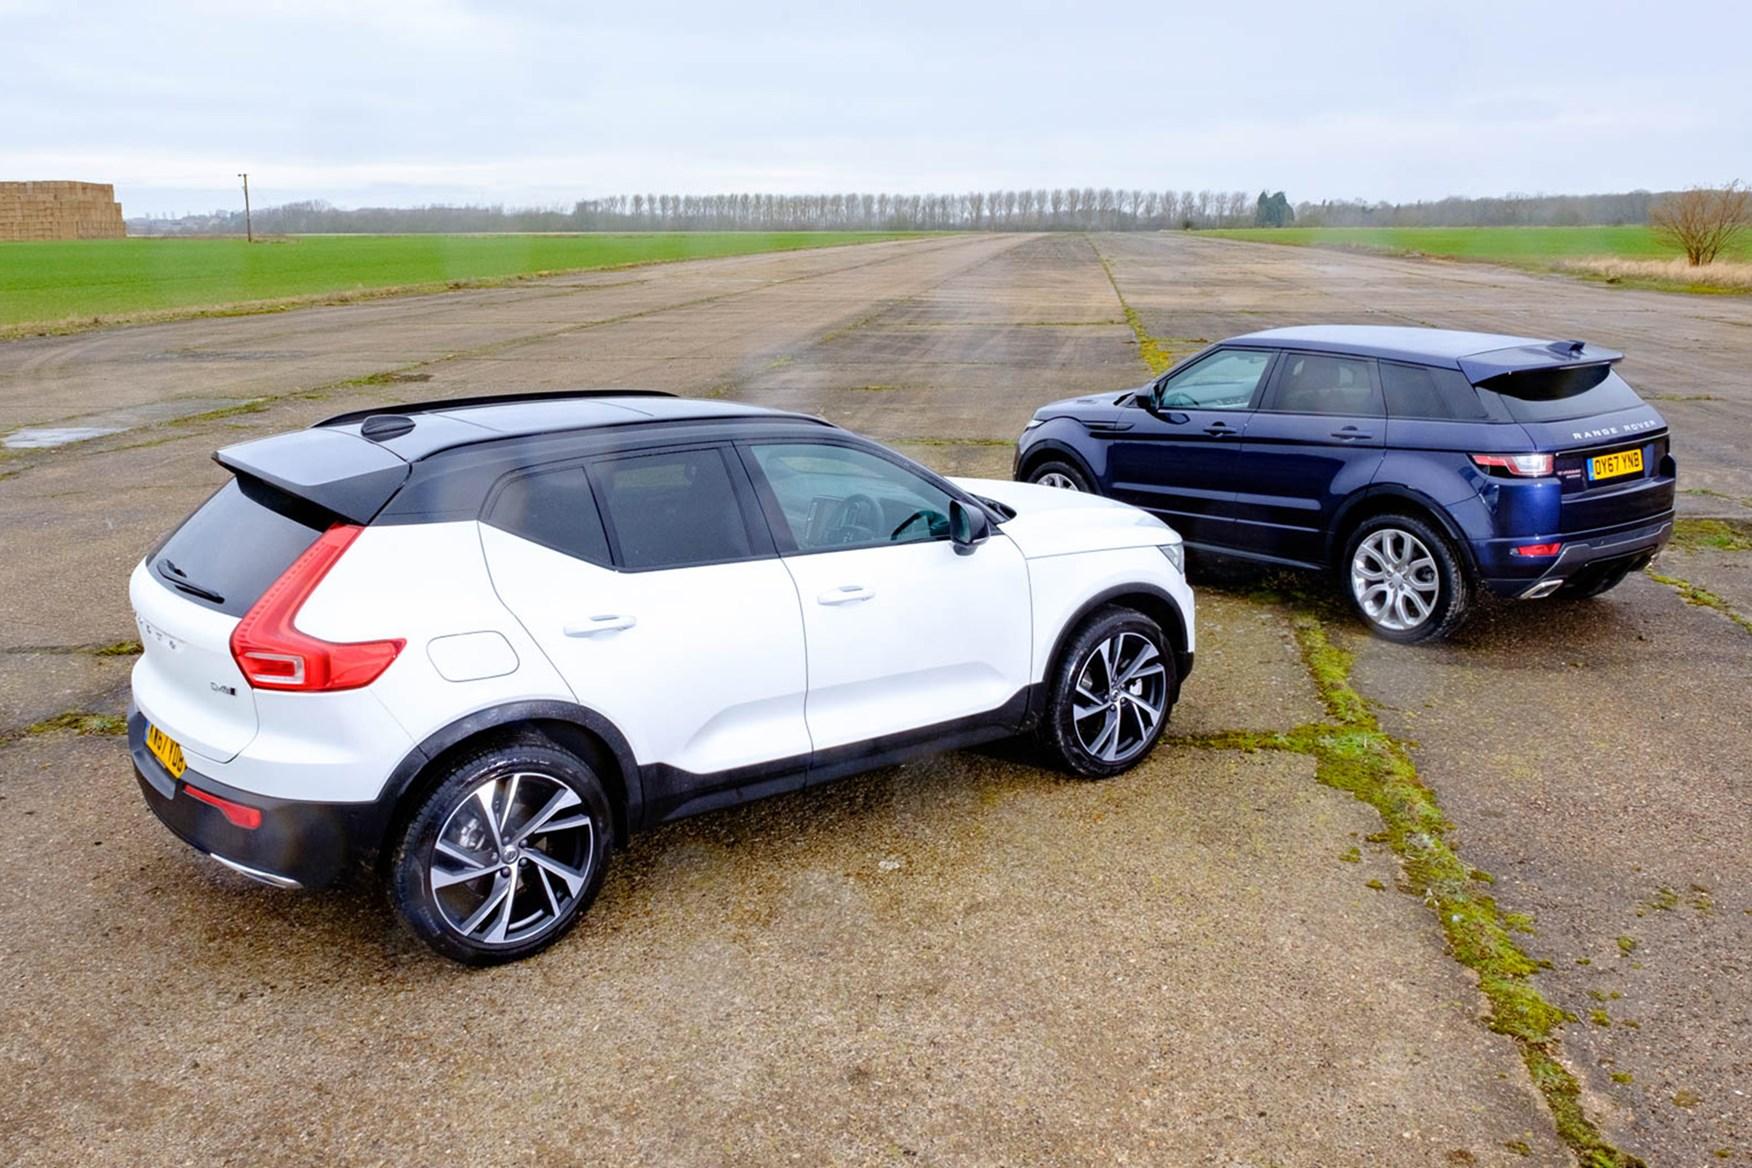 Range Rover vs Volvo XC40